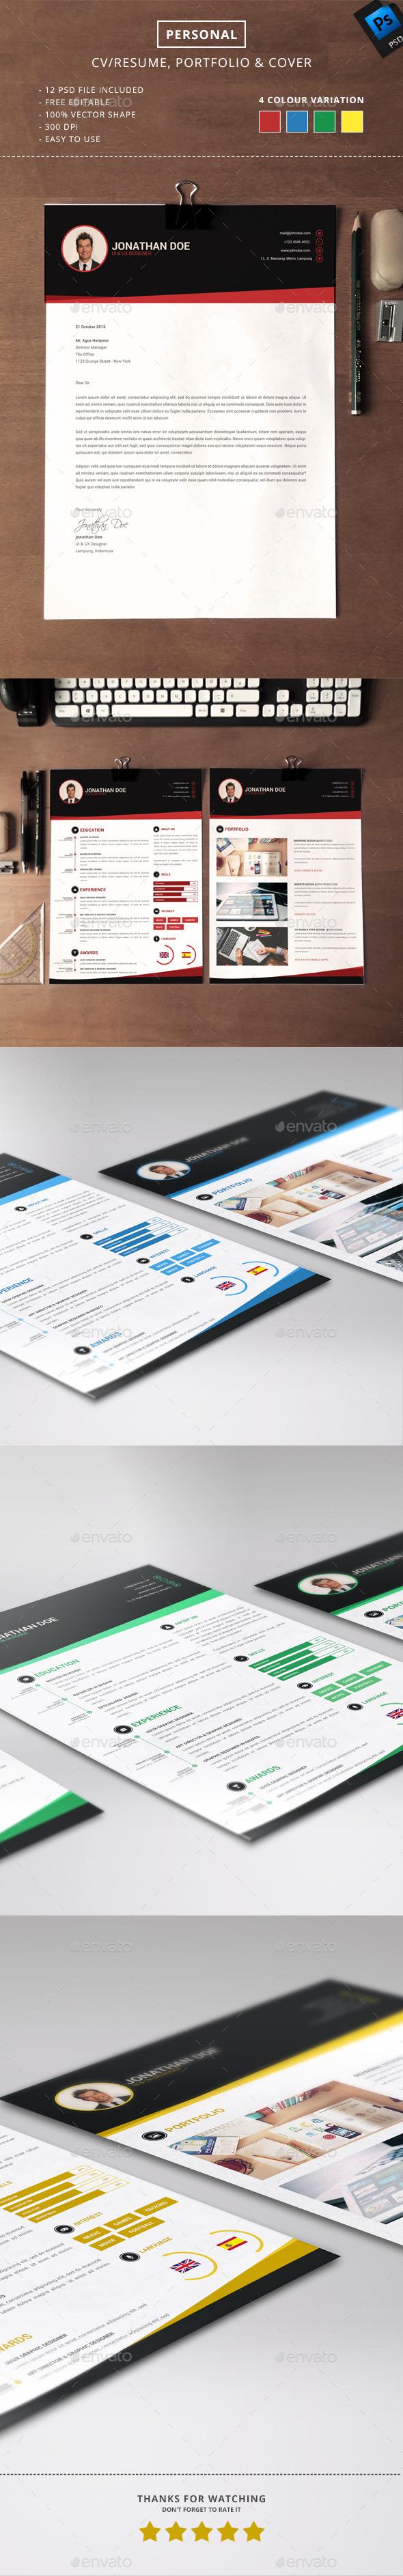 Personal CV/Resume, Portfolio & Cover - Resumes Stationery